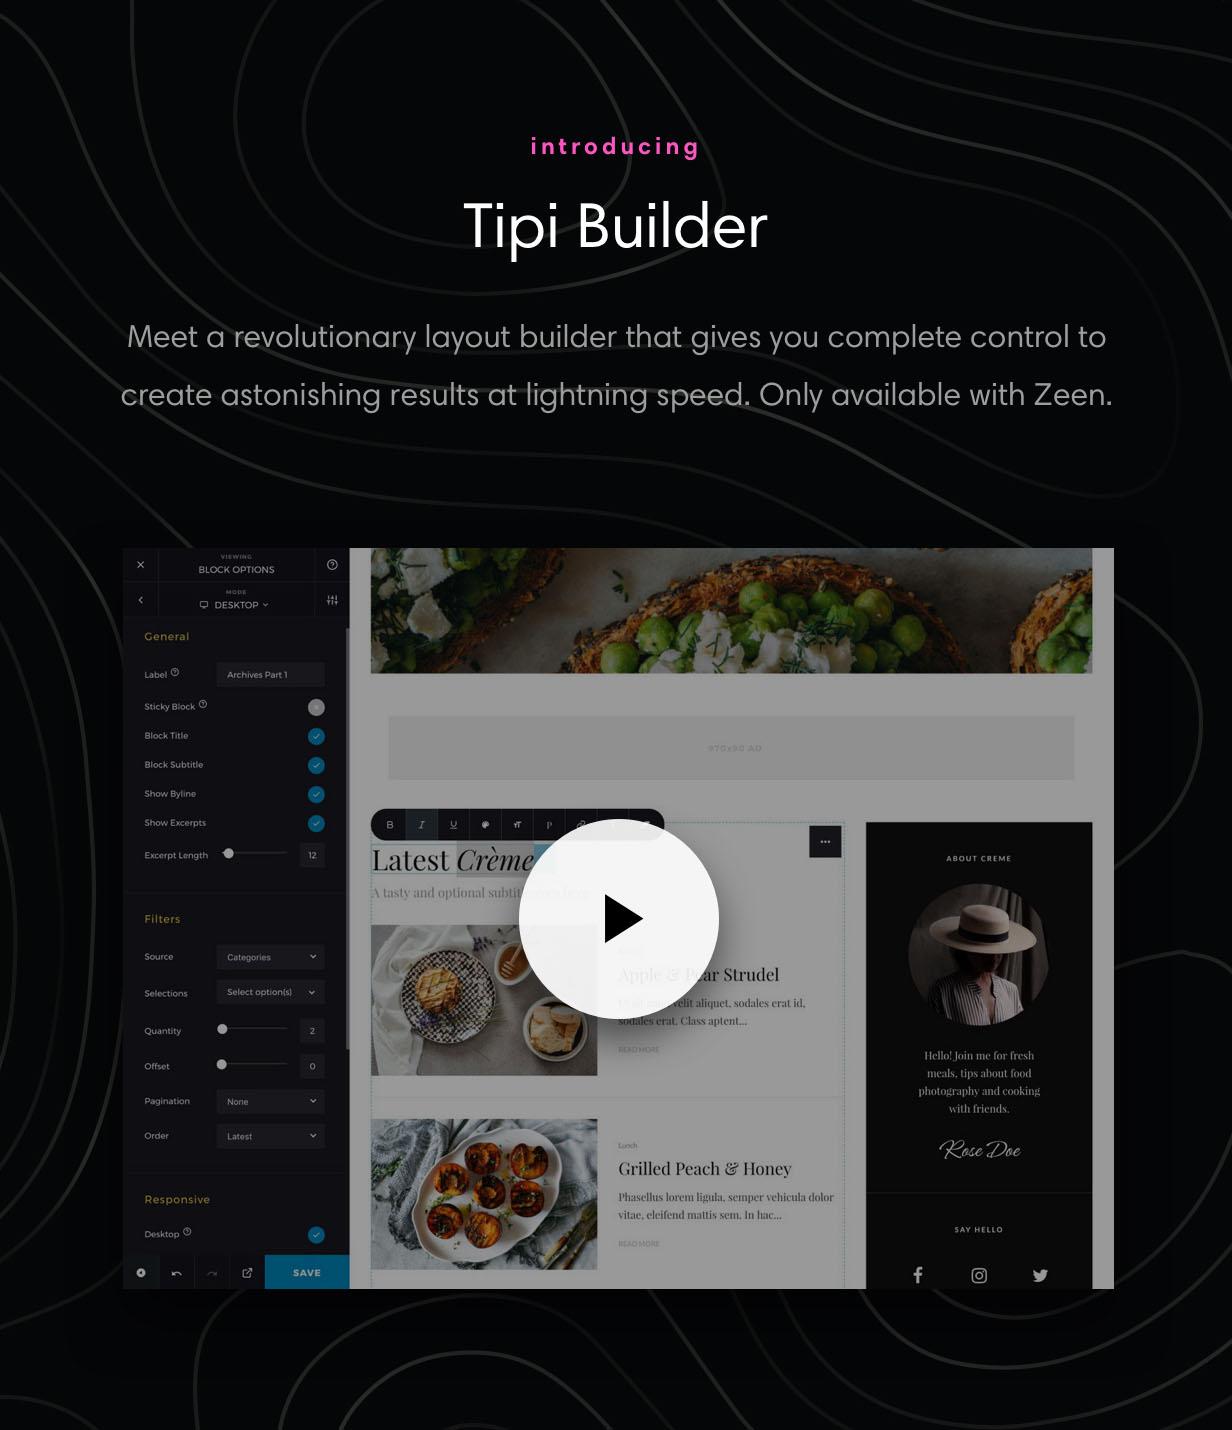 zeen meet tipi builder - Zeen | Next Generation Magazine WordPress Theme